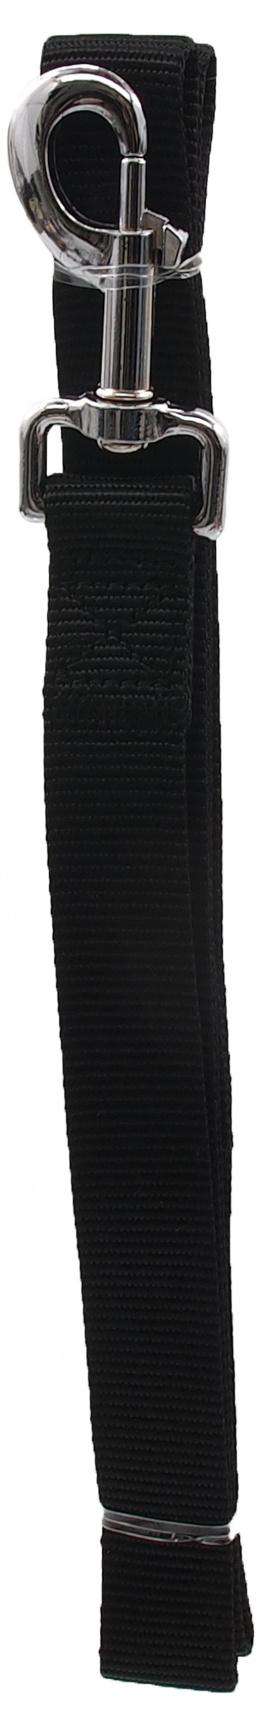 Pavada – Dog Fantasy L, 120 cm, krāsa – melna